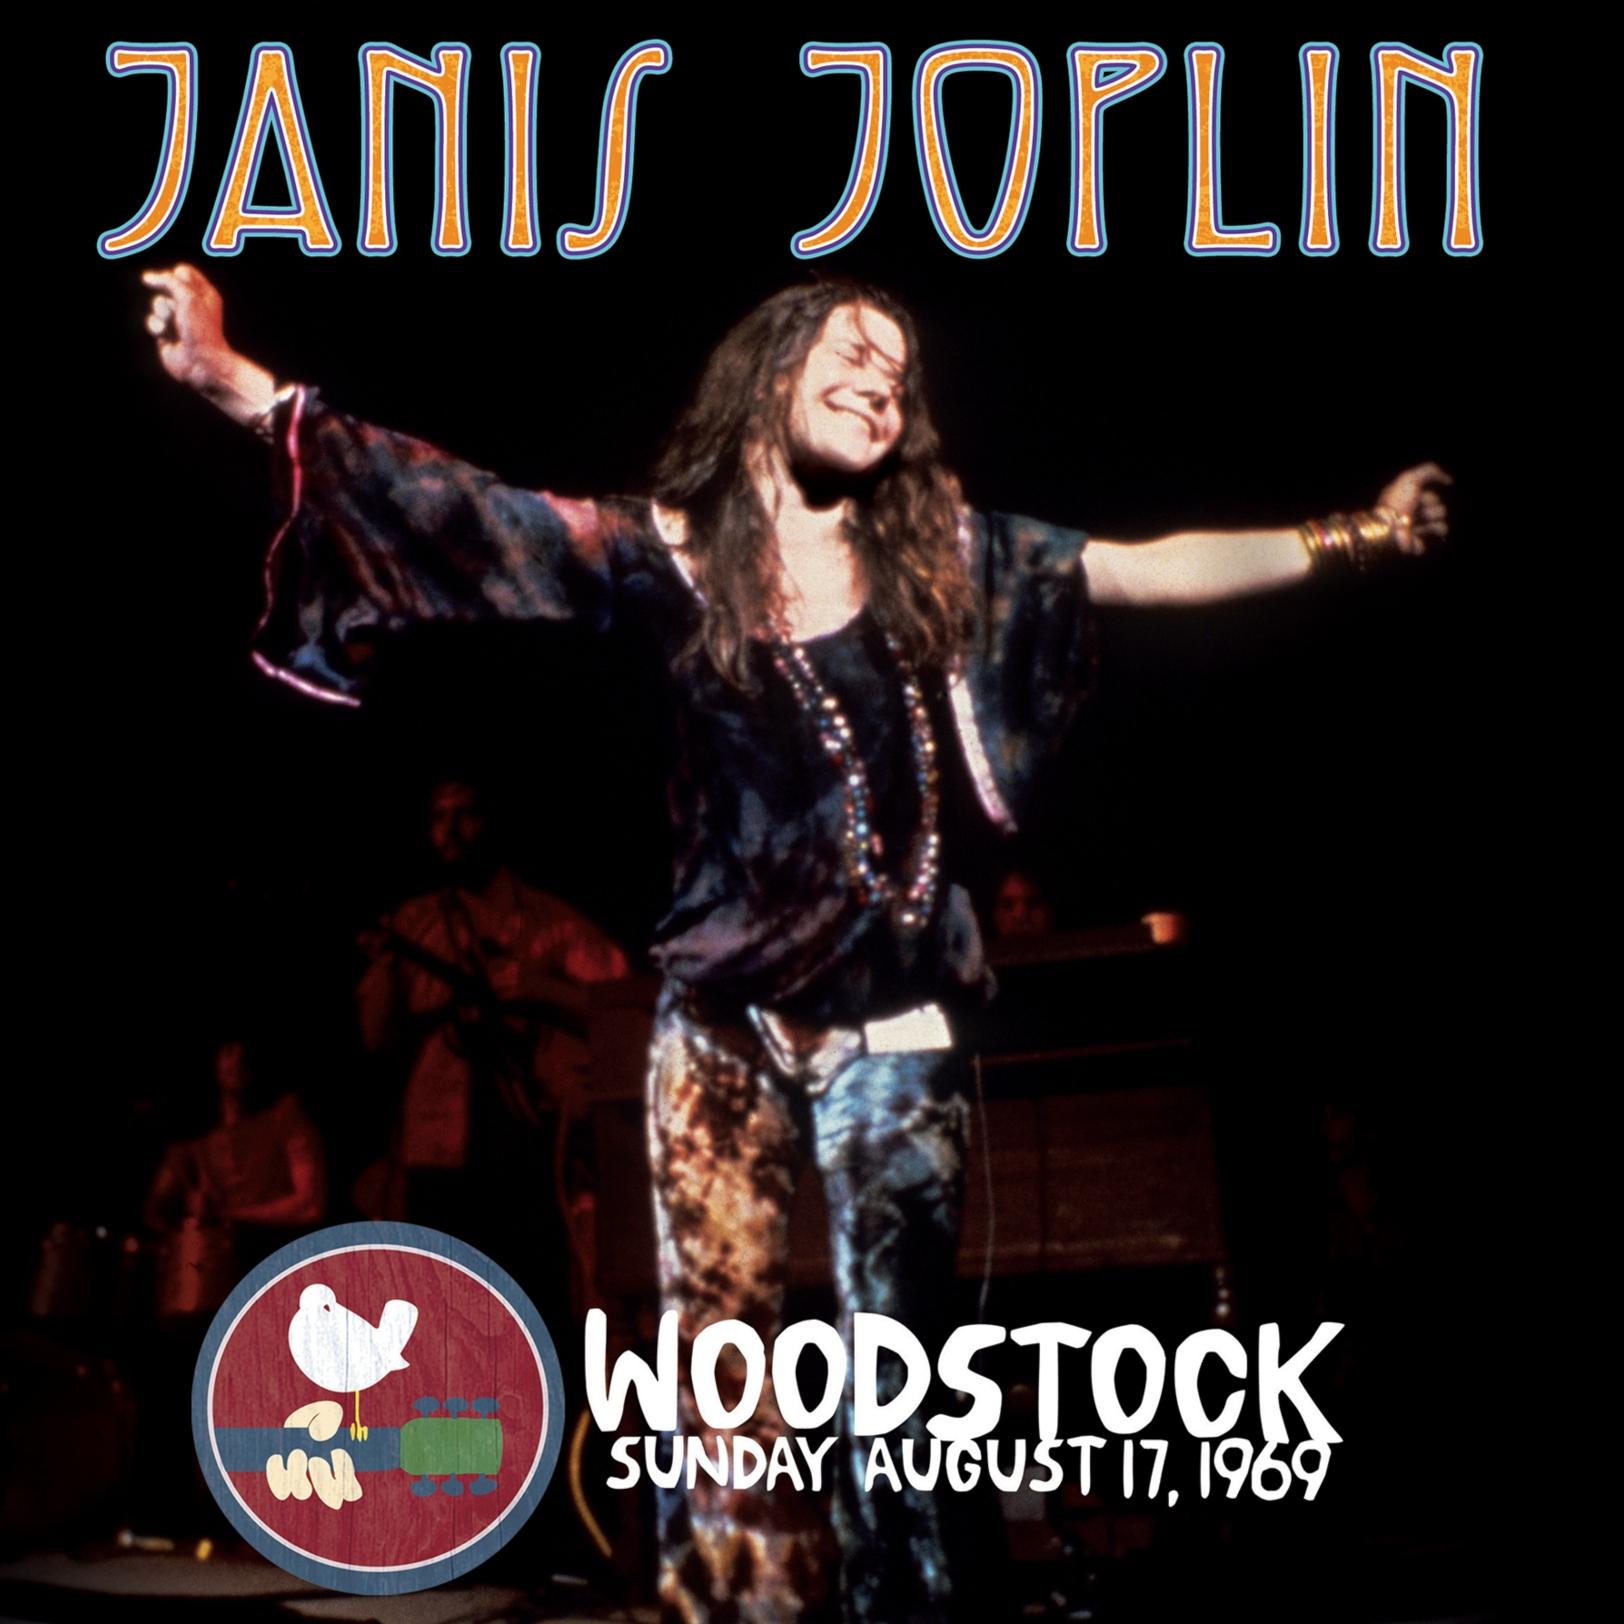 JANIS JOPLIN | 'Woodstock Sunday August 17, 1969'